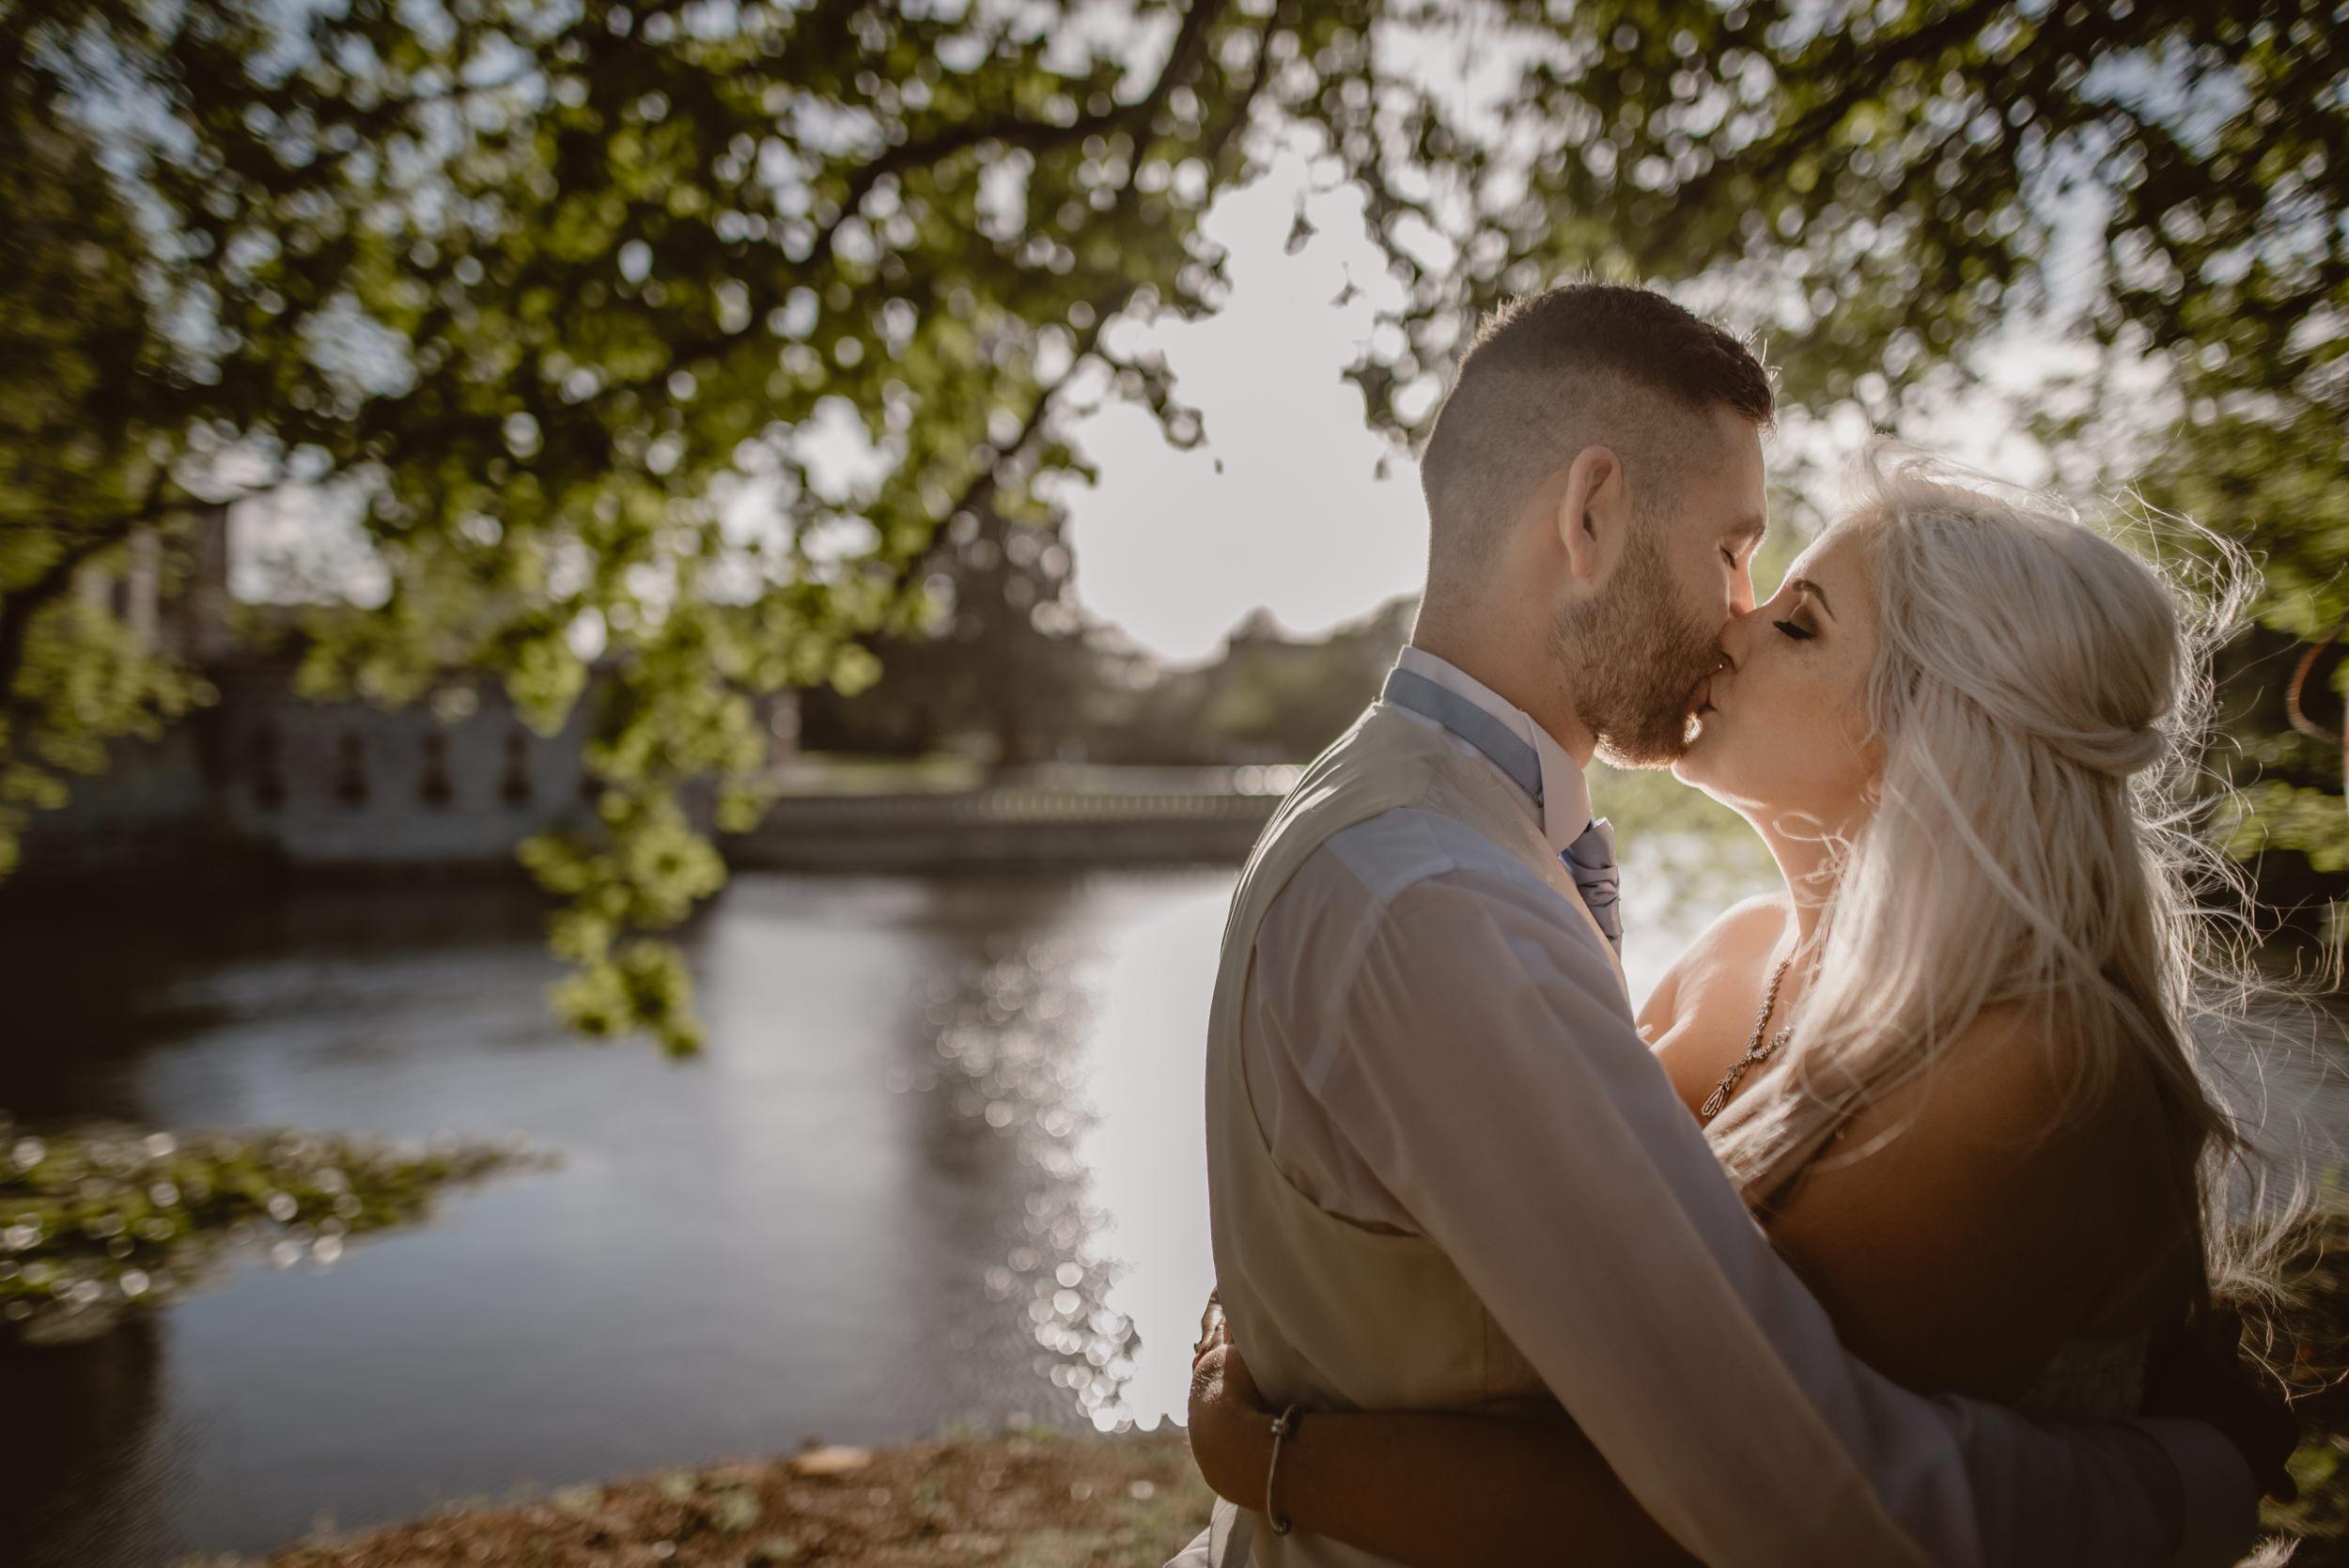 Rachel-and-James-Wedding-Horsley-Towers-State-Manu-Mendoza-Wedding-Photography-488.jpg